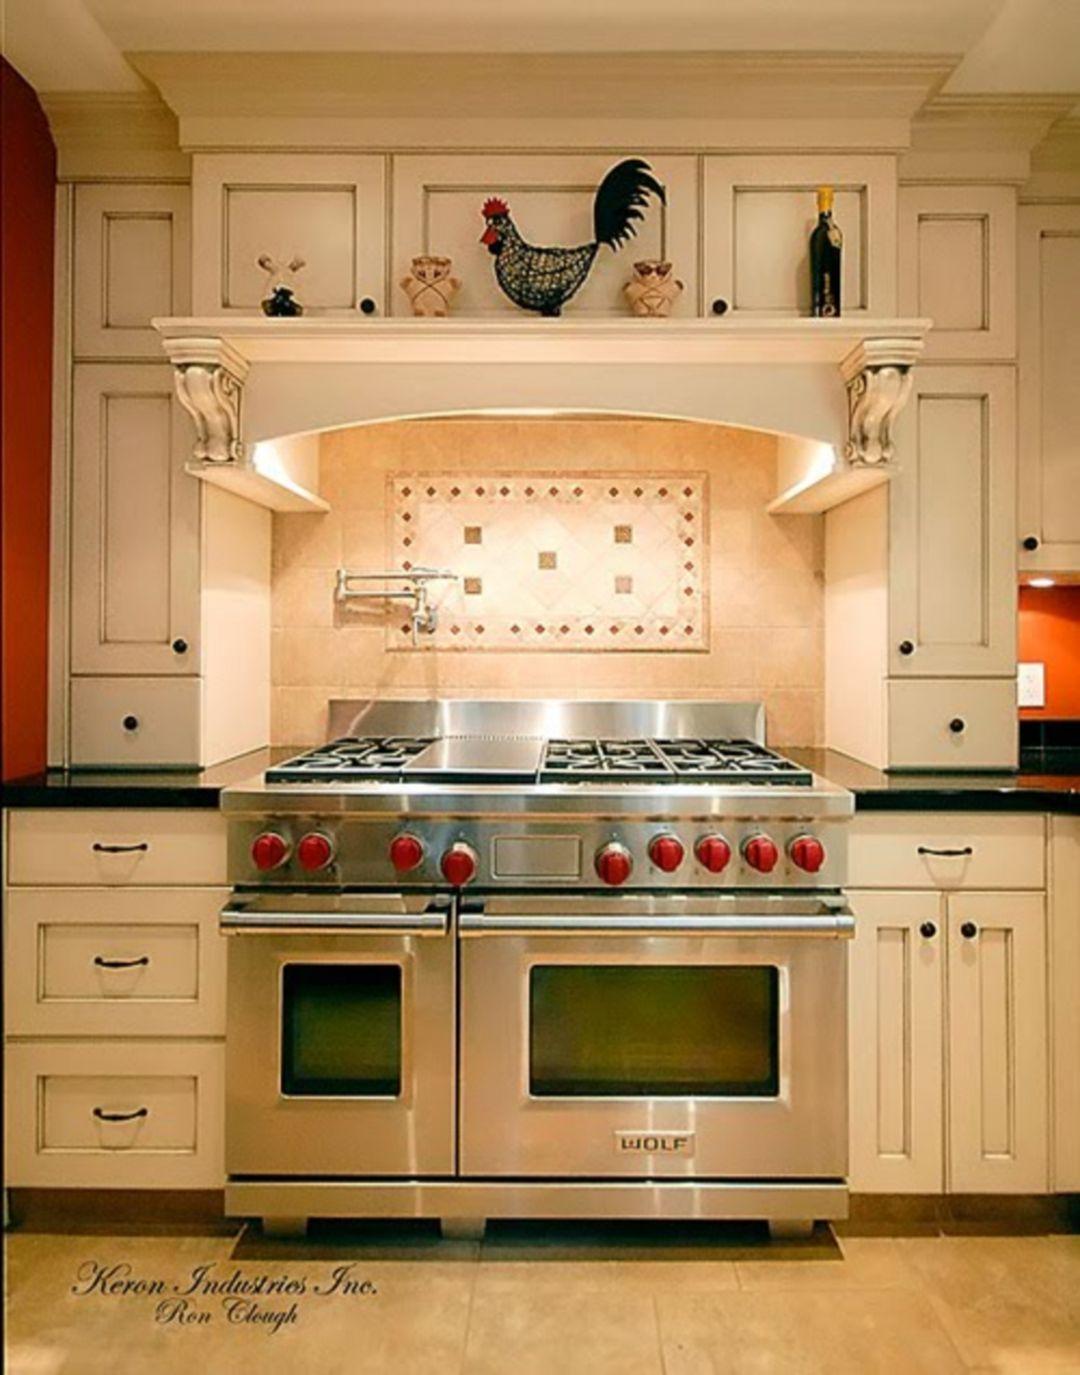 small kitchen coffee themed kitchen decor pinterest coffee rh in pinterest com